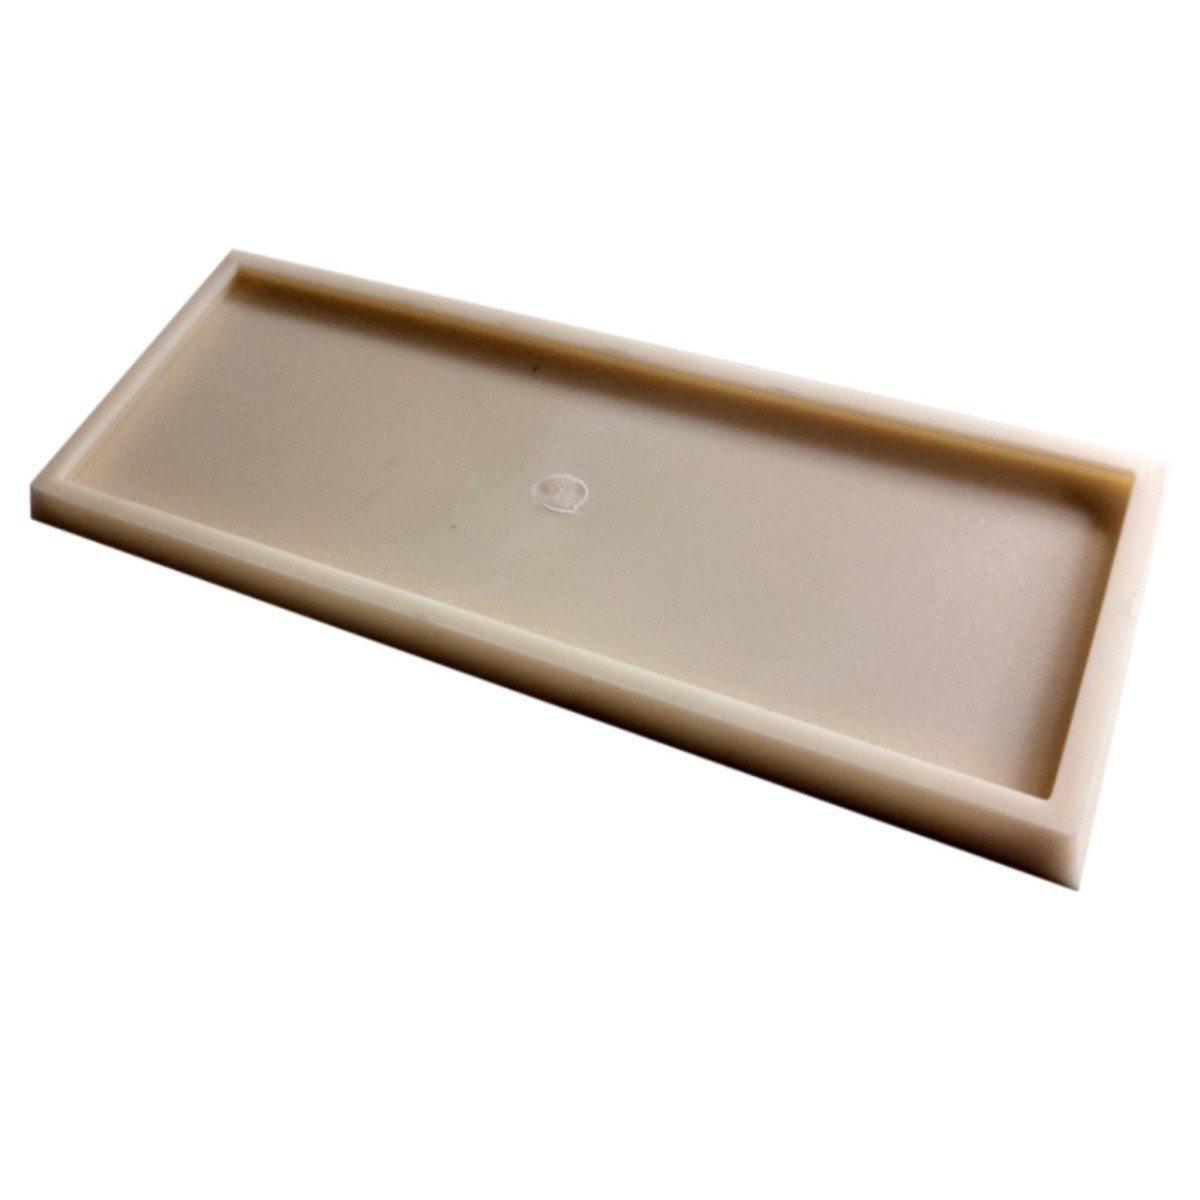 Raimondi Smart Grout Float 10'' x 4'', Replacement Rubber Pad